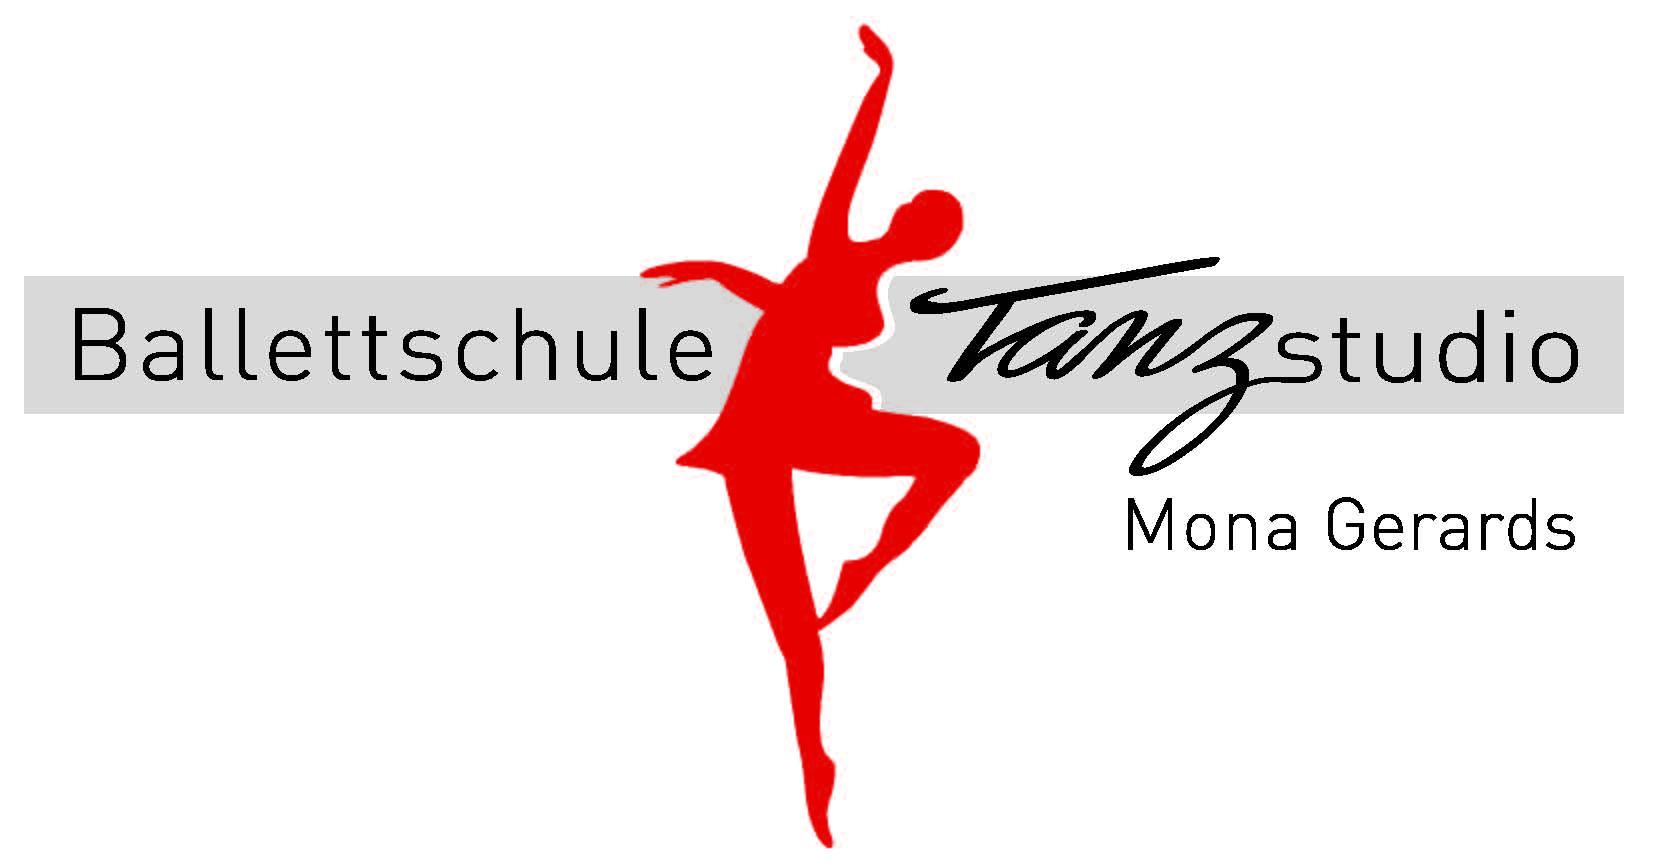 Ballettschule - Tanzstudio Mona Gerards